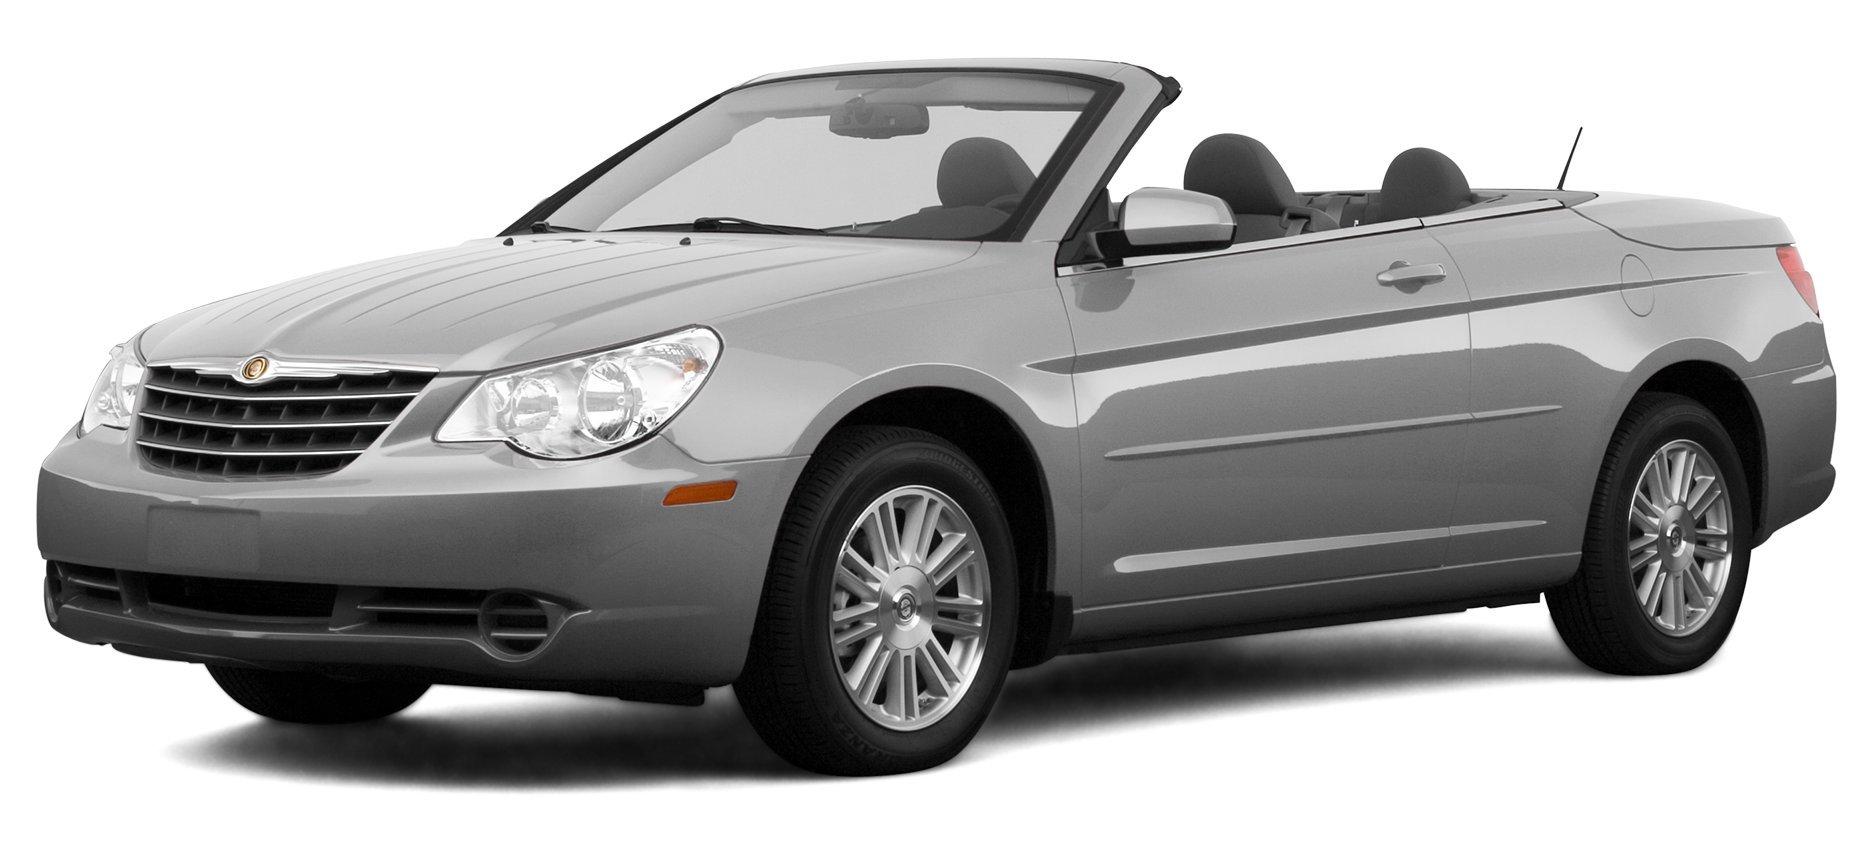 2008 Chrysler Sebring LX, 2-Door Convertible Front Wheel Drive ...